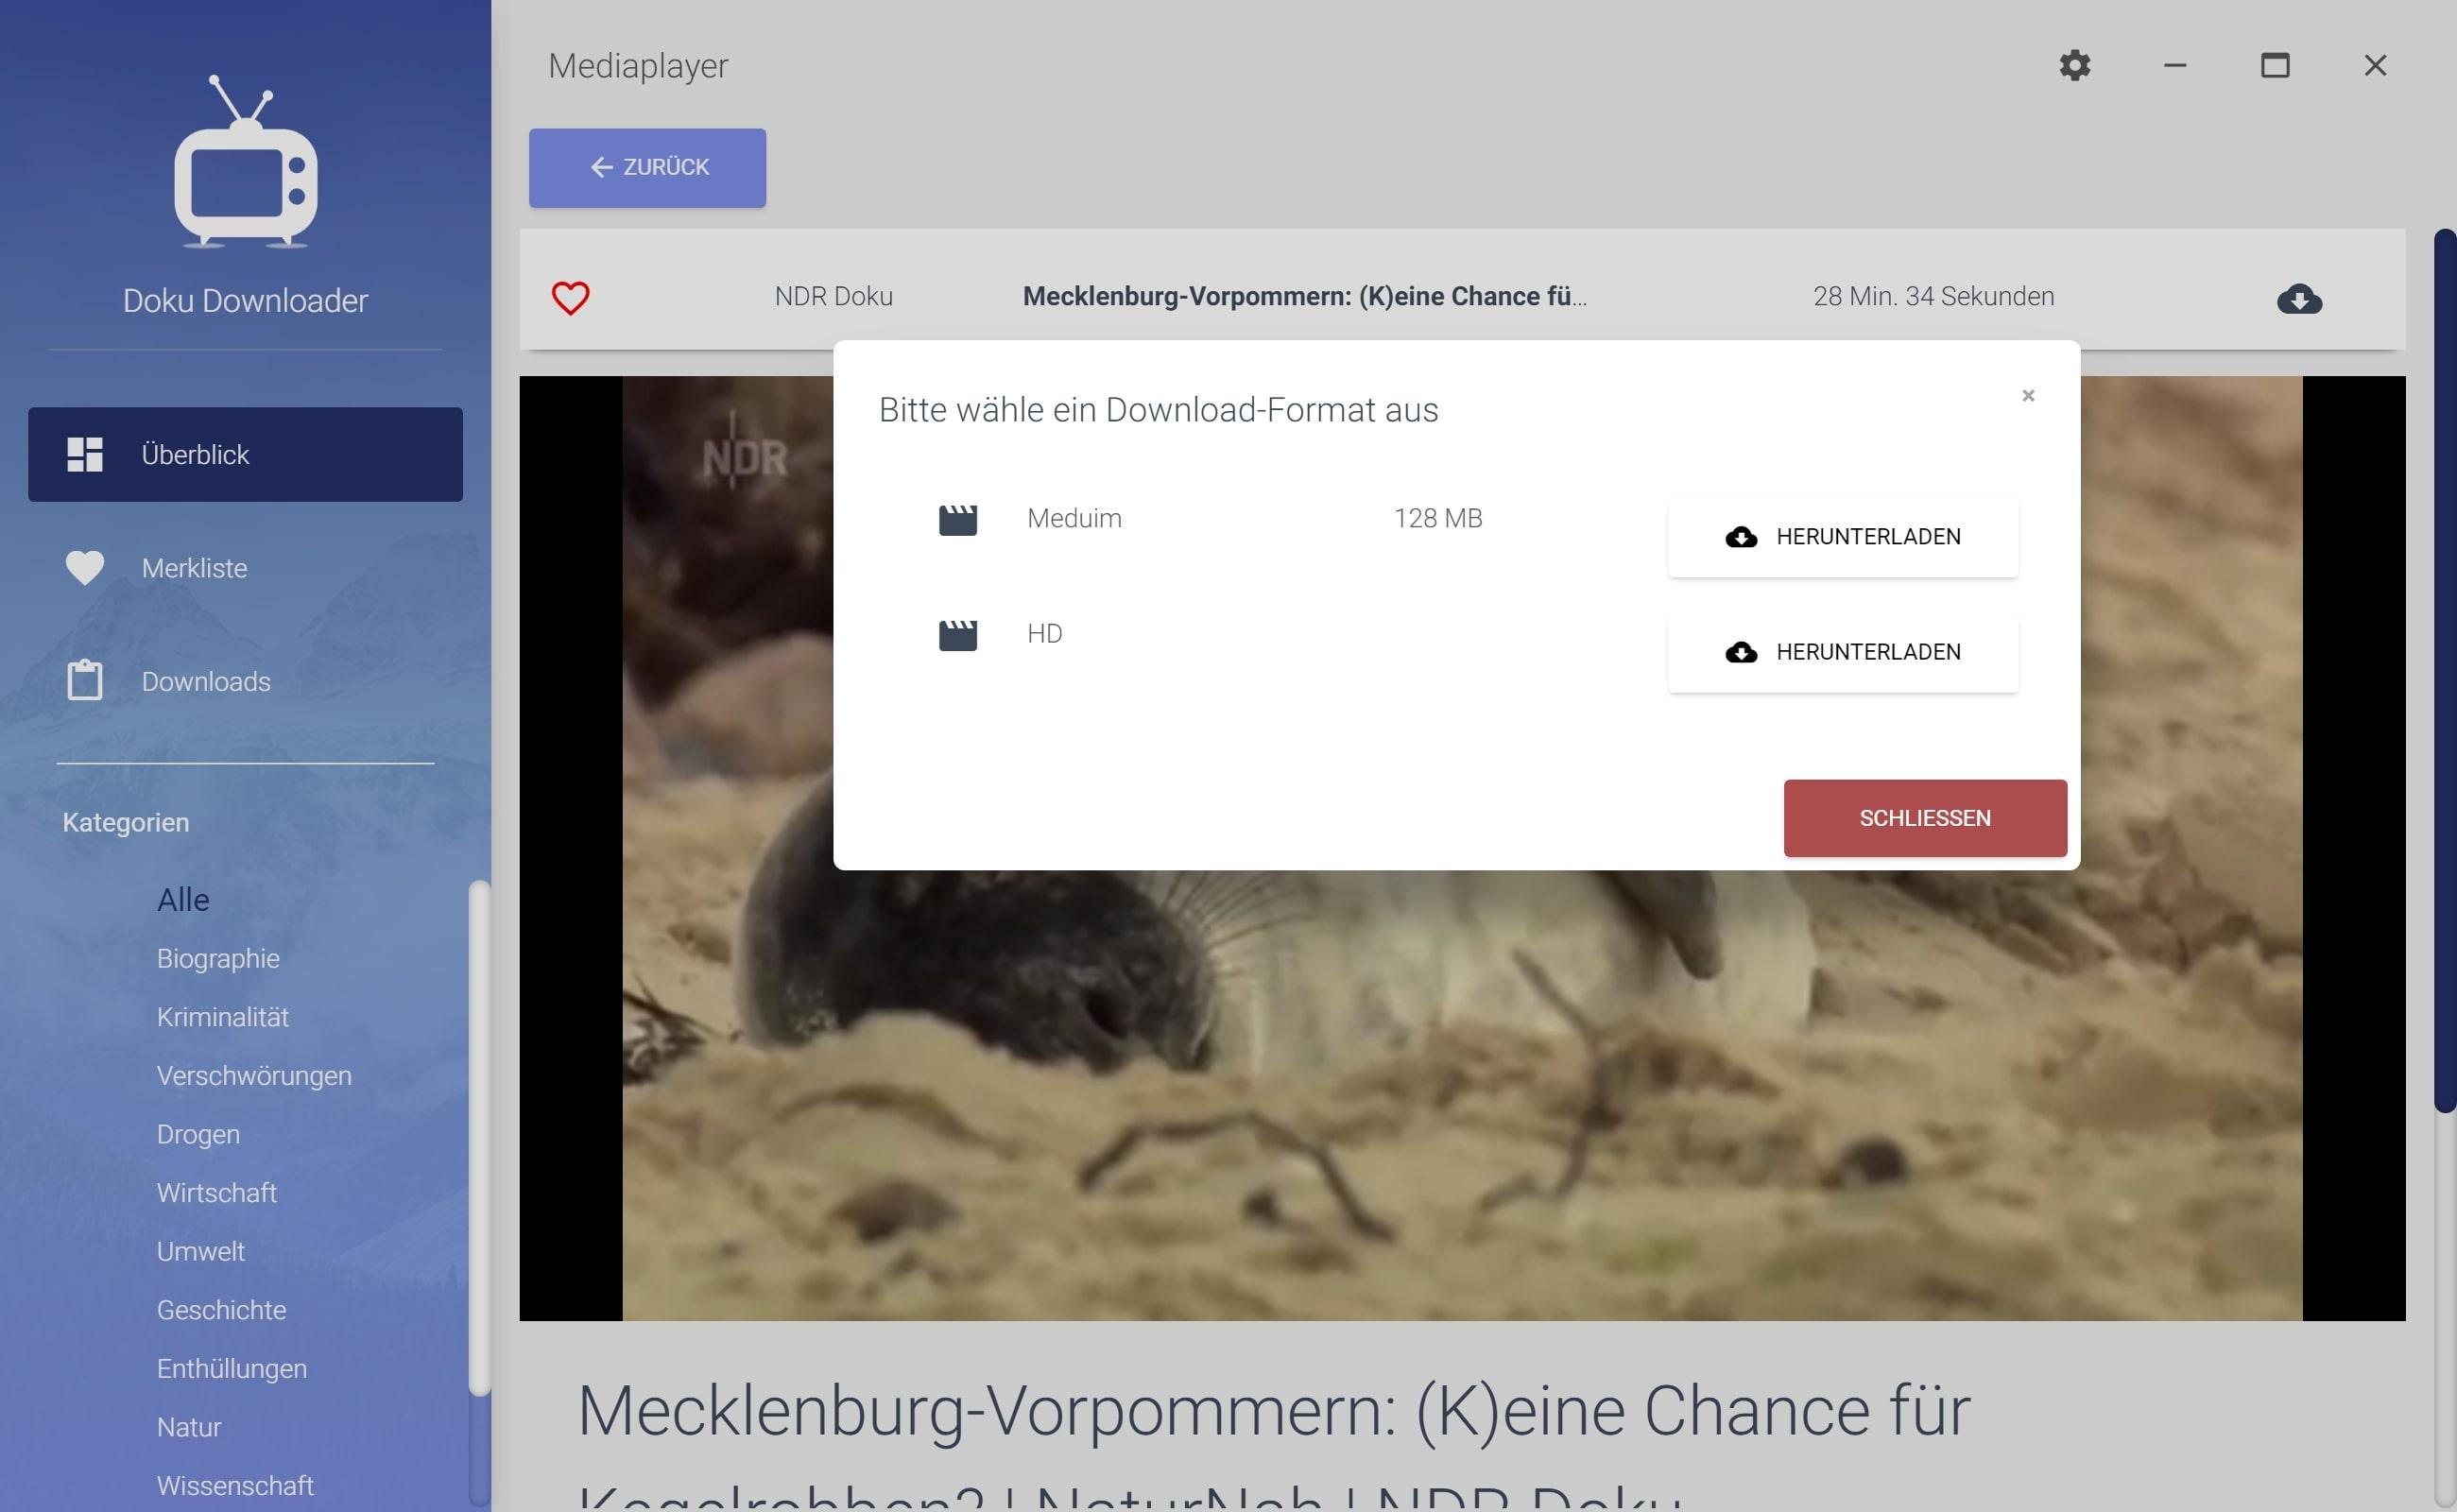 NDR Dokumentation aus Mediathek herunterladen - Downloadformat